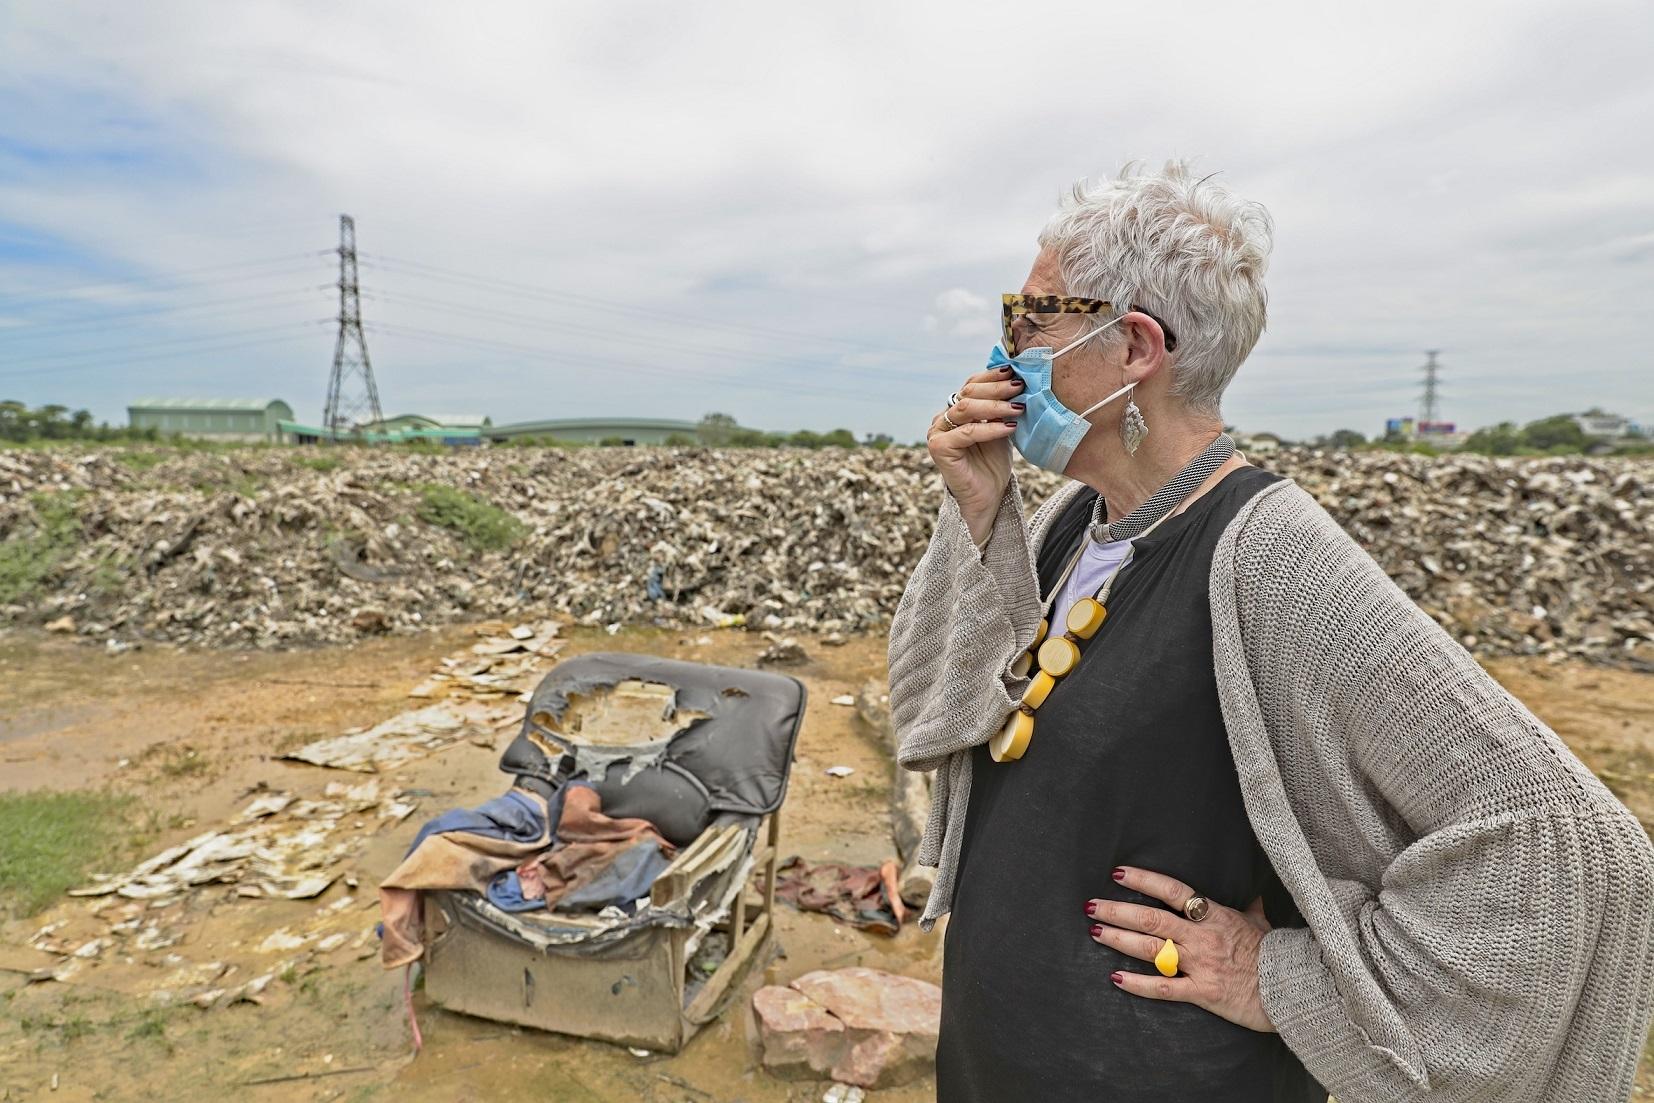 Ronni Kahn at landfill site in Thailand_image credit Bruno Kataoka_Food Fighter film